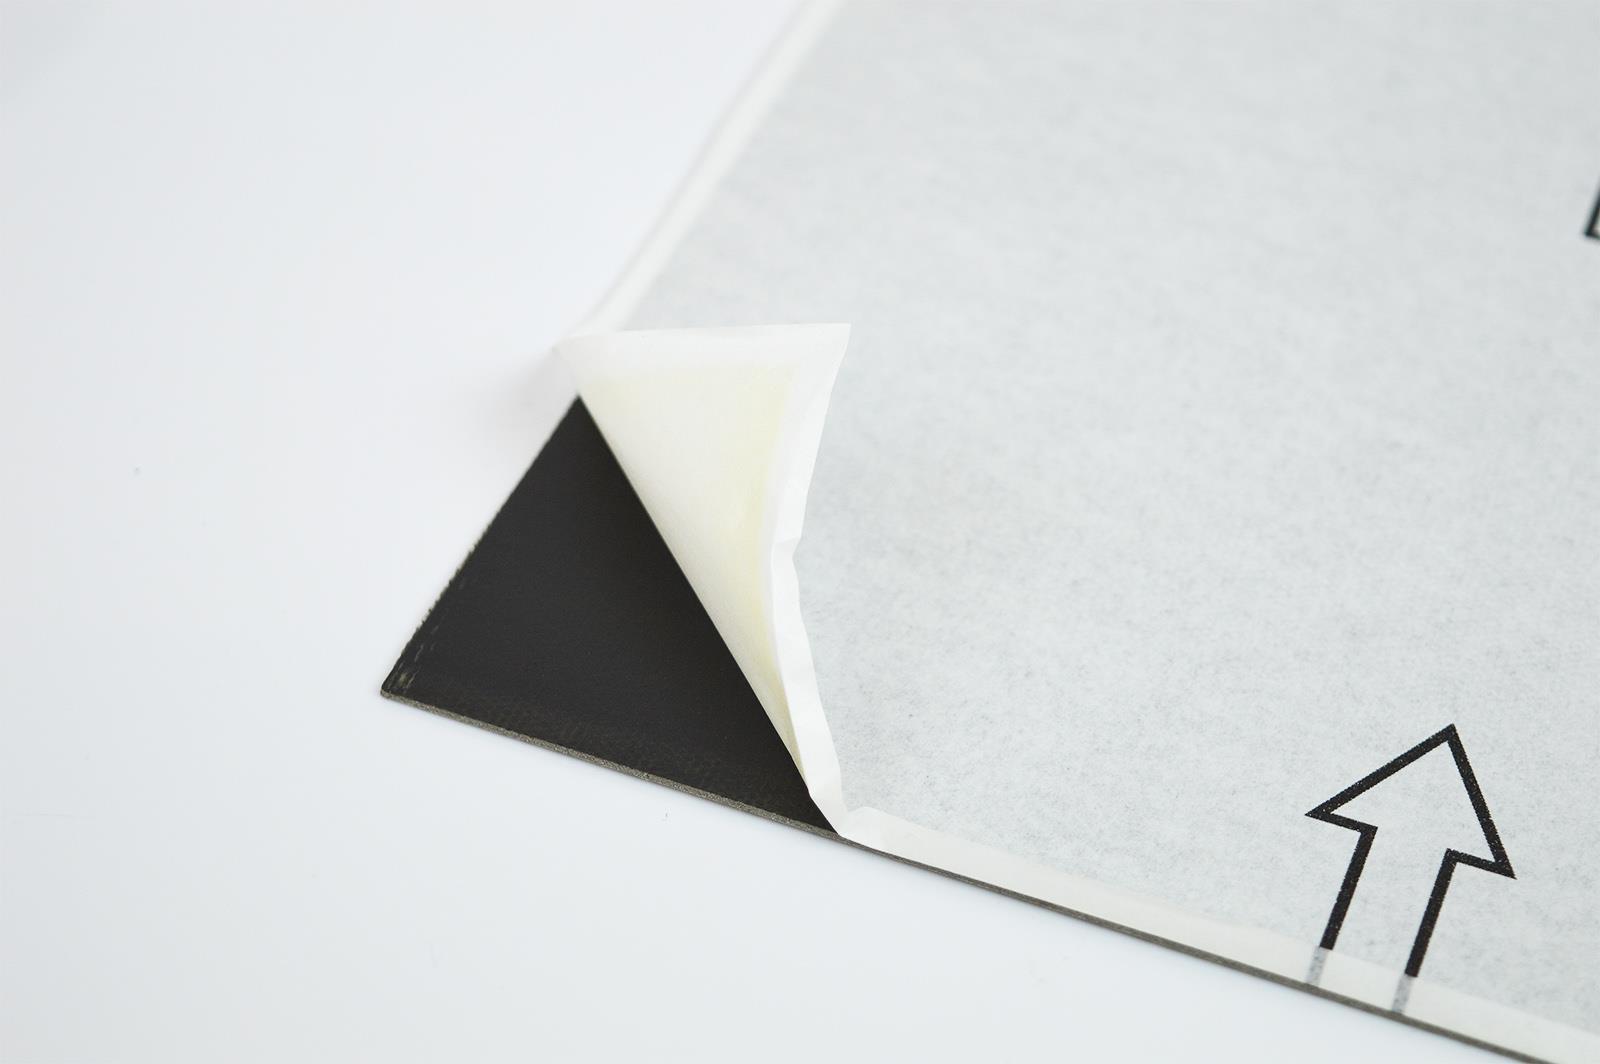 Floor-Tiles-Self-Adhesive-Vinyl-Flooring-Kitchen-Bathroom-Brown-Wood-Grain thumbnail 21